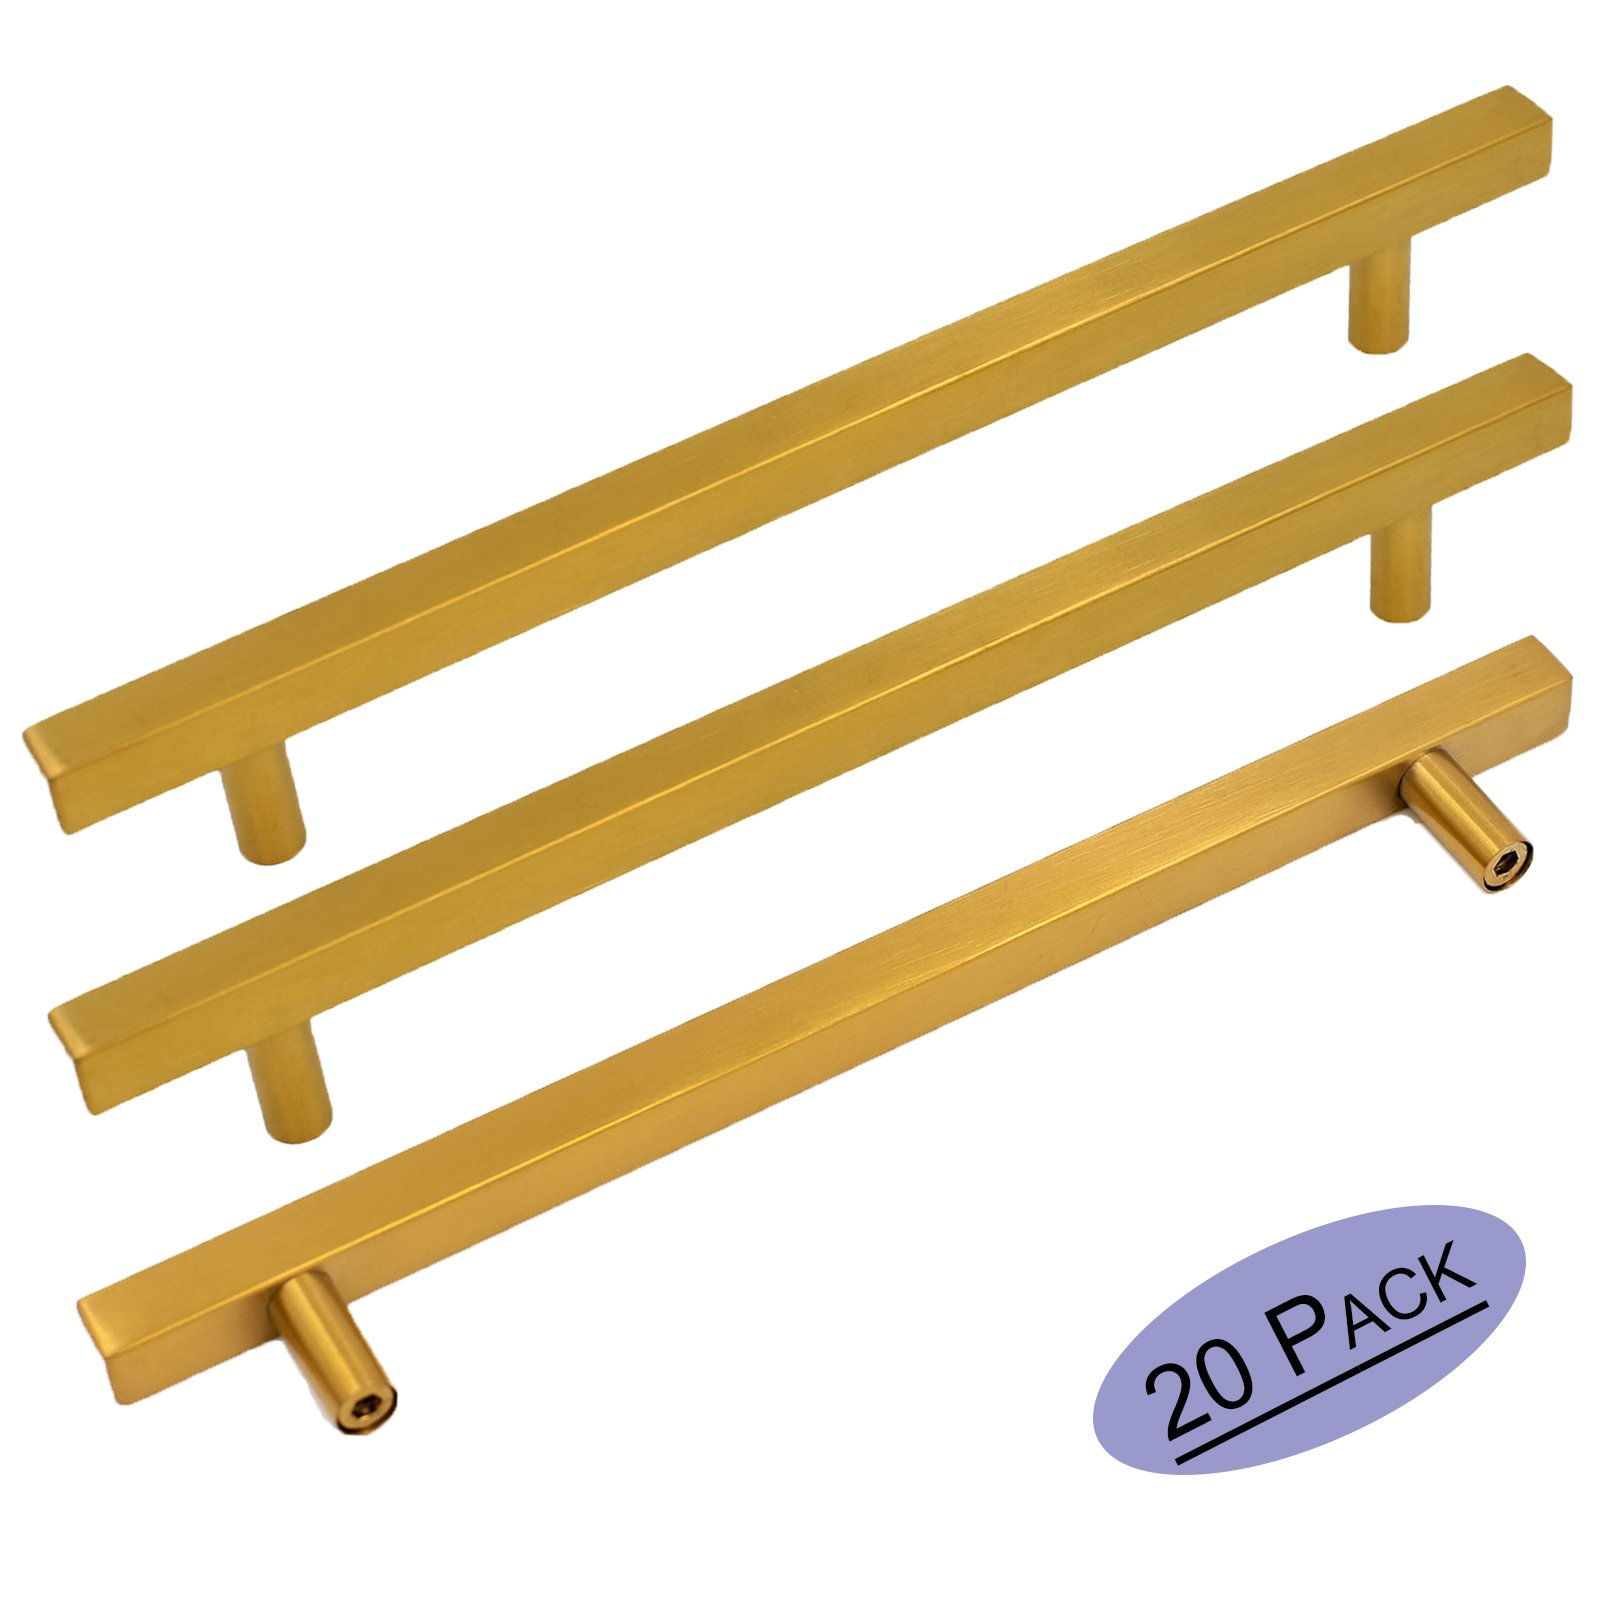 Brushed Brass Cabinet Pulls kitchen Hardware Drawer Pulls 7.5 Inch Hole Centers - Goldenwarm LS1212GD192 Square T Bar Gold Knobs Dresser Cupboard Door Handles Stainless Steel 20 Pack